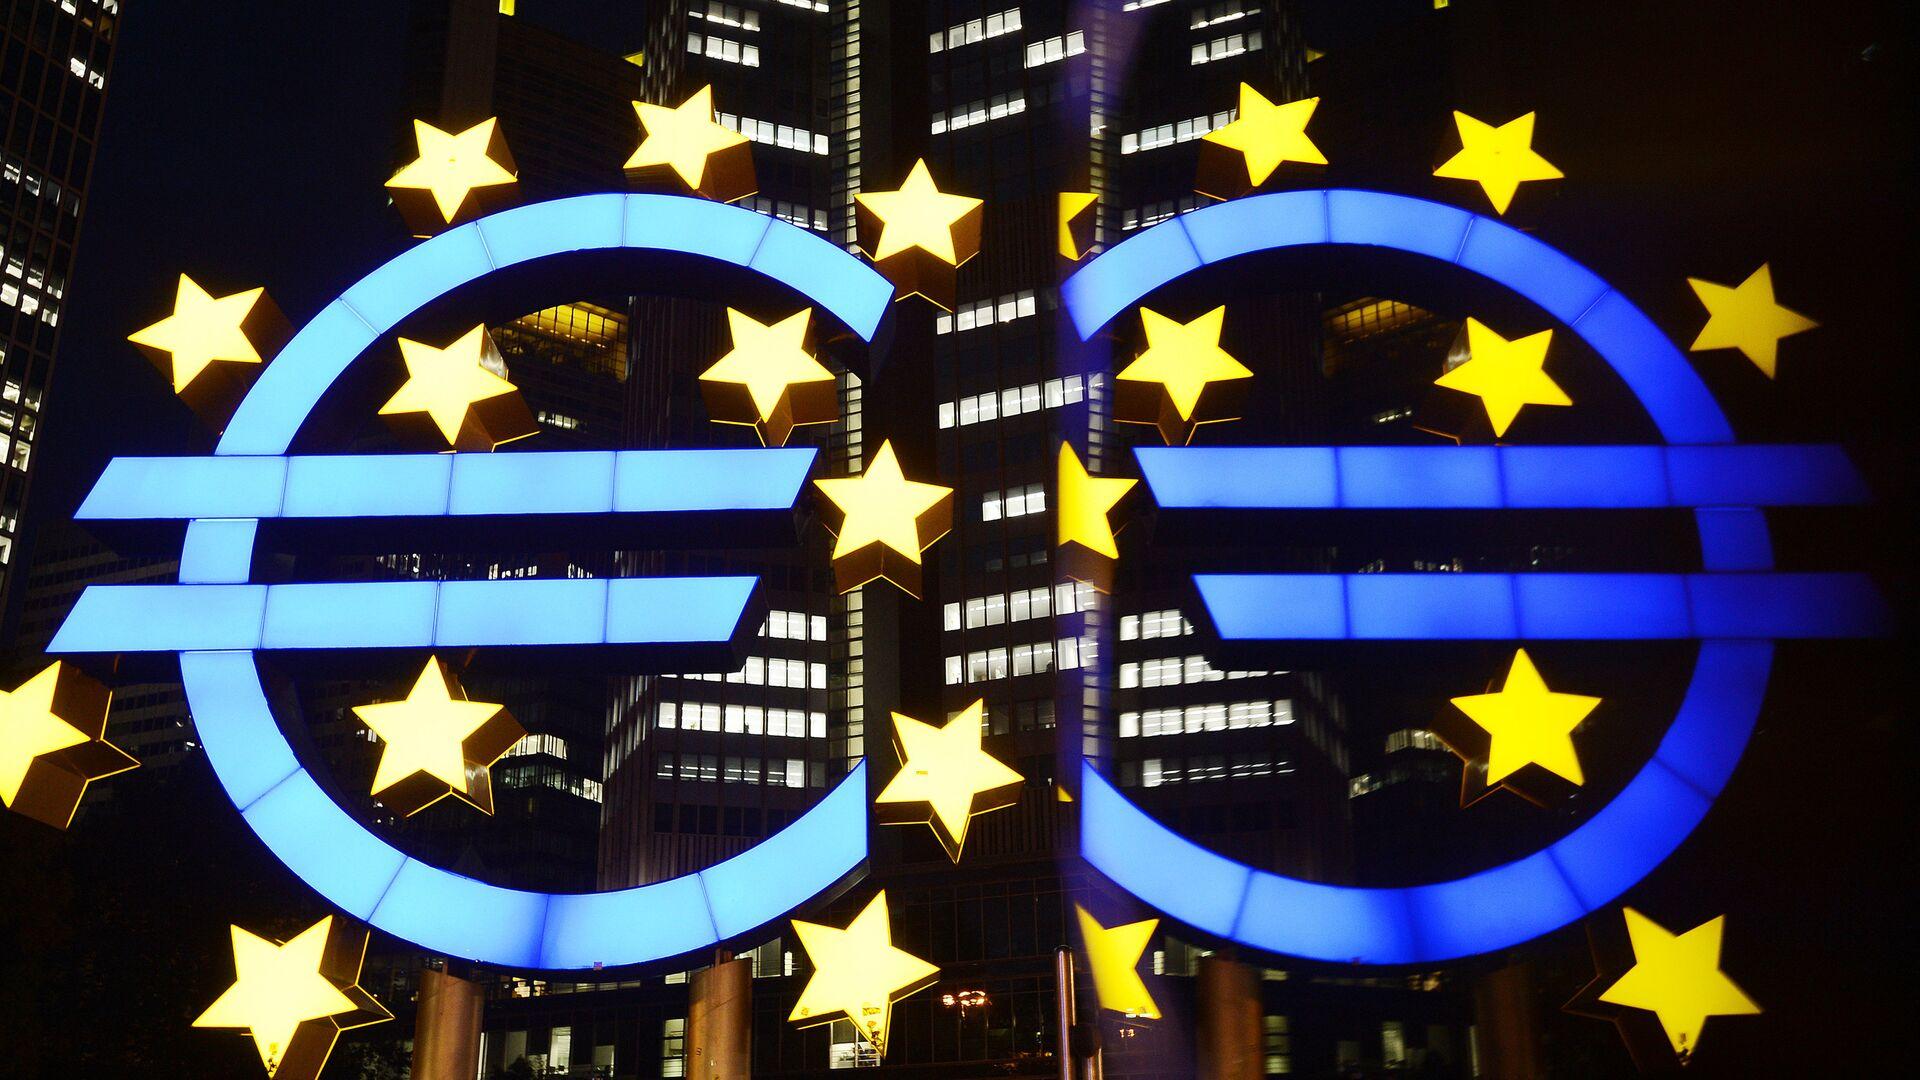 Логотип Центрального европейского банка во Франкфурте - РИА Новости, 1920, 13.08.2021